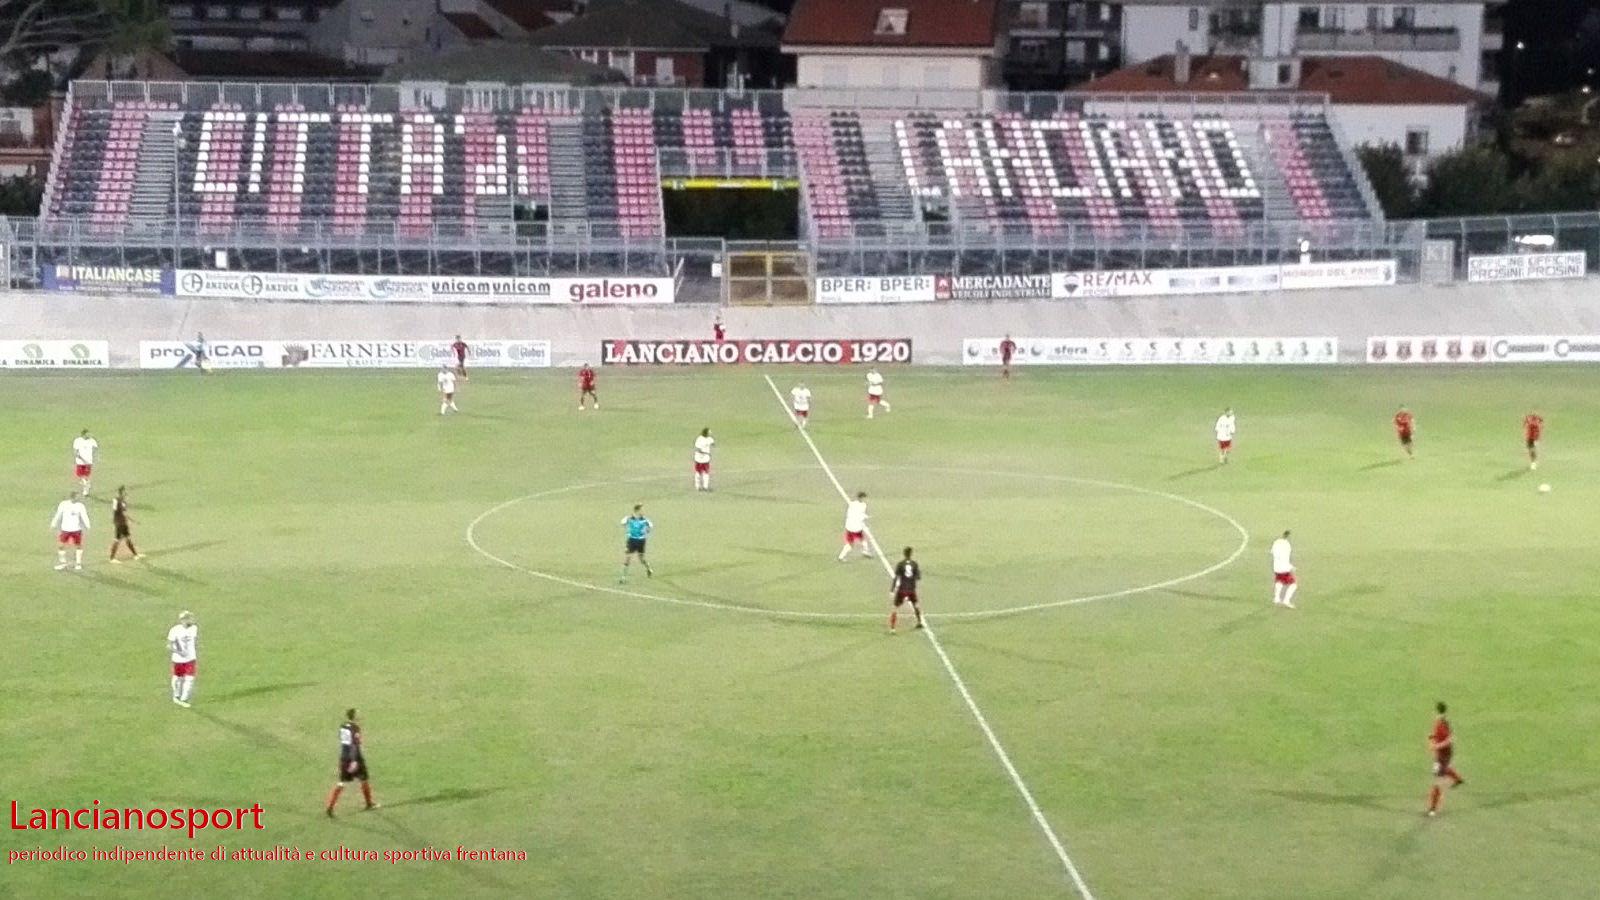 Luca di Monteodorisio arbitra Lanciano-Paterno